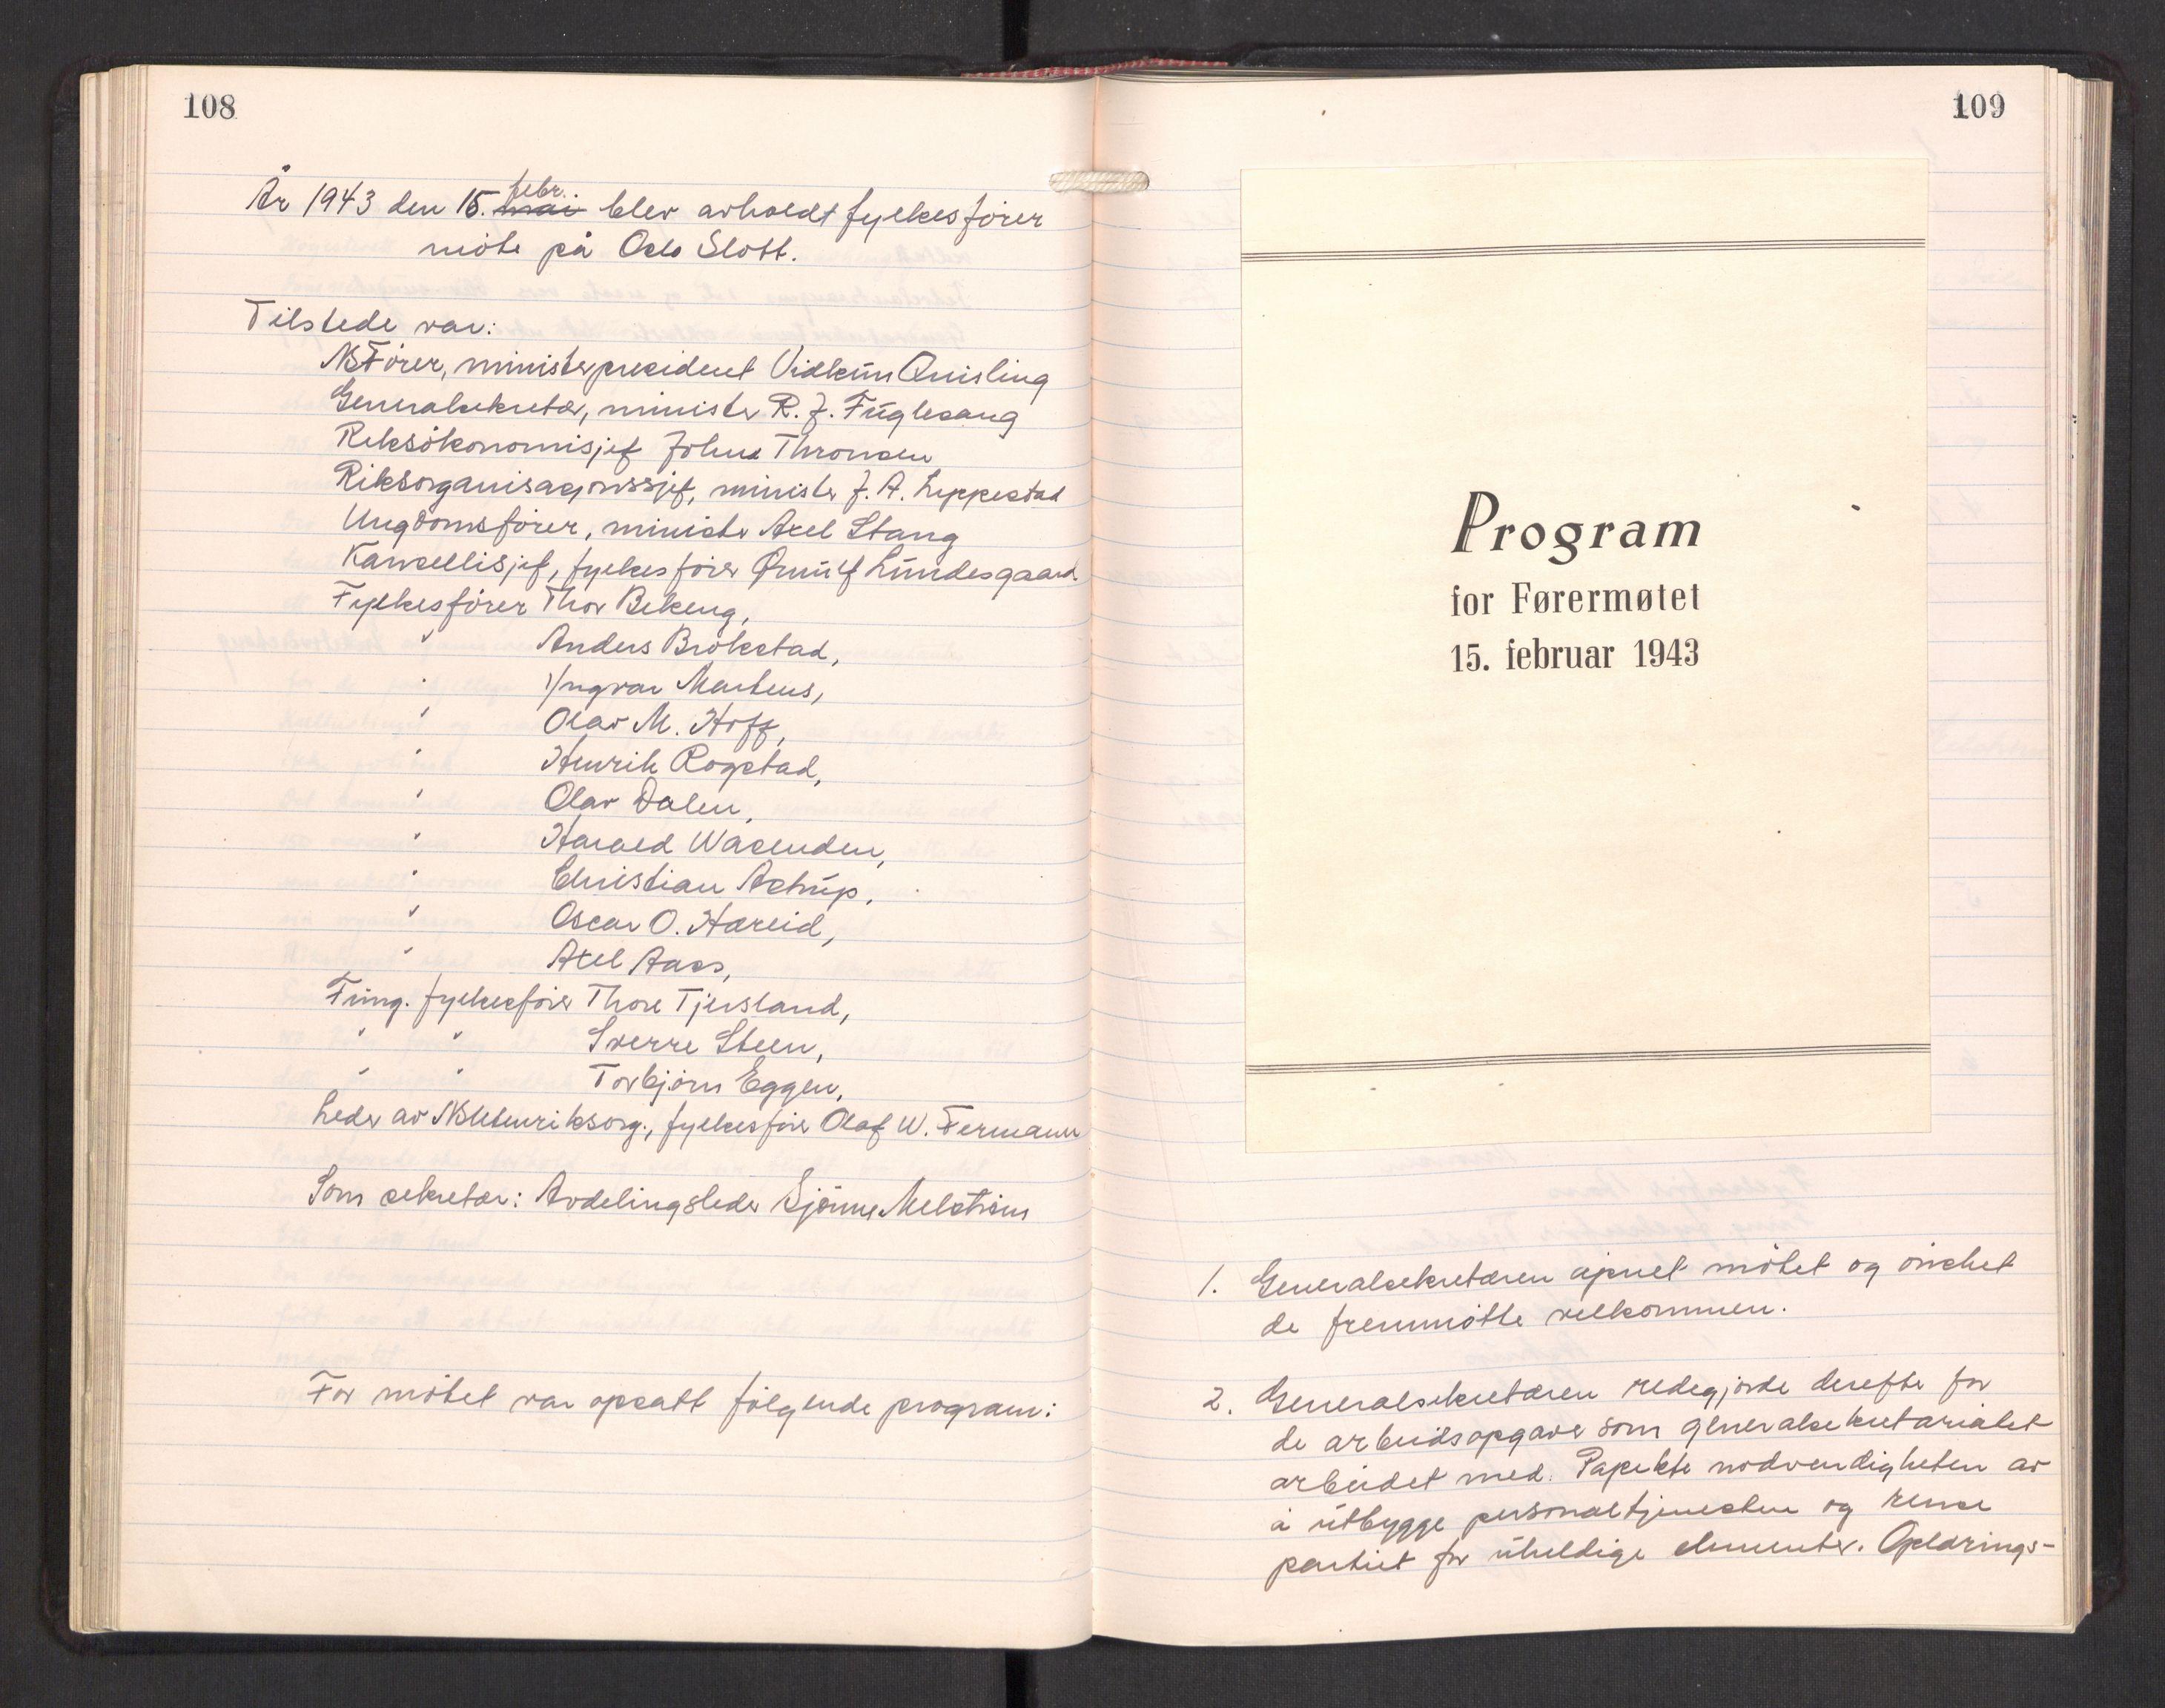 RA, Nasjonal Samling (NS) Generalsekretariat, A/L0117: NS Riks- og Rådsmøteprotokoll, 1934-1945, p. 108-109